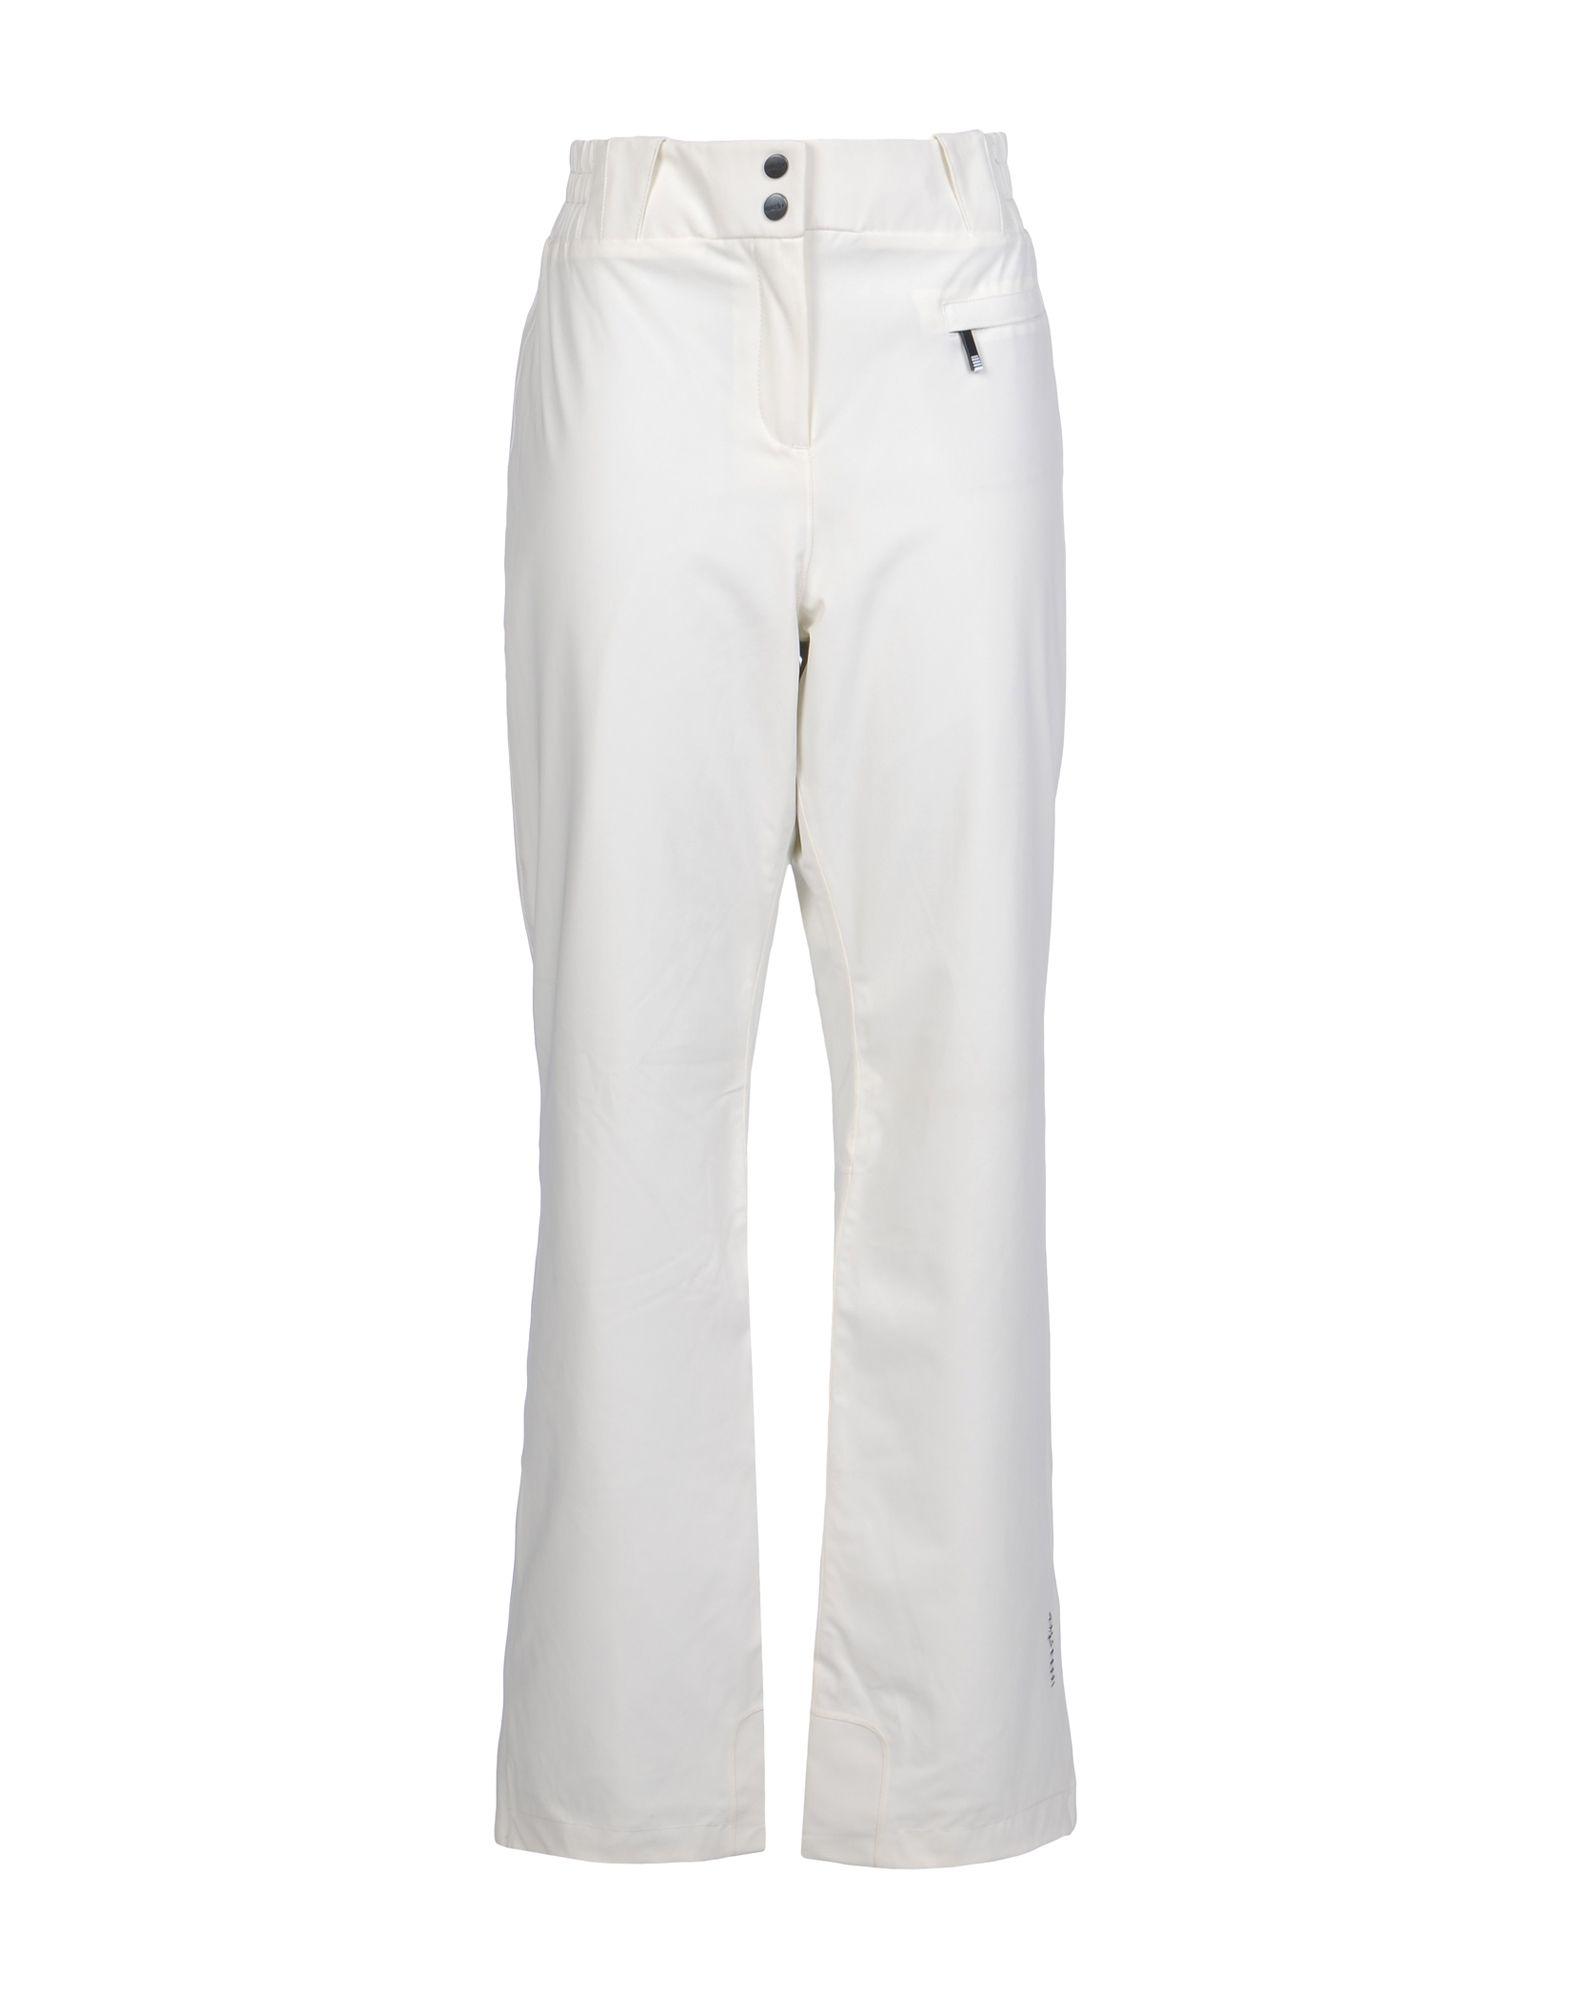 Pantalone Dritto Rh+ Stance W Pants - Donna - Acquista online su bXNhh7ra